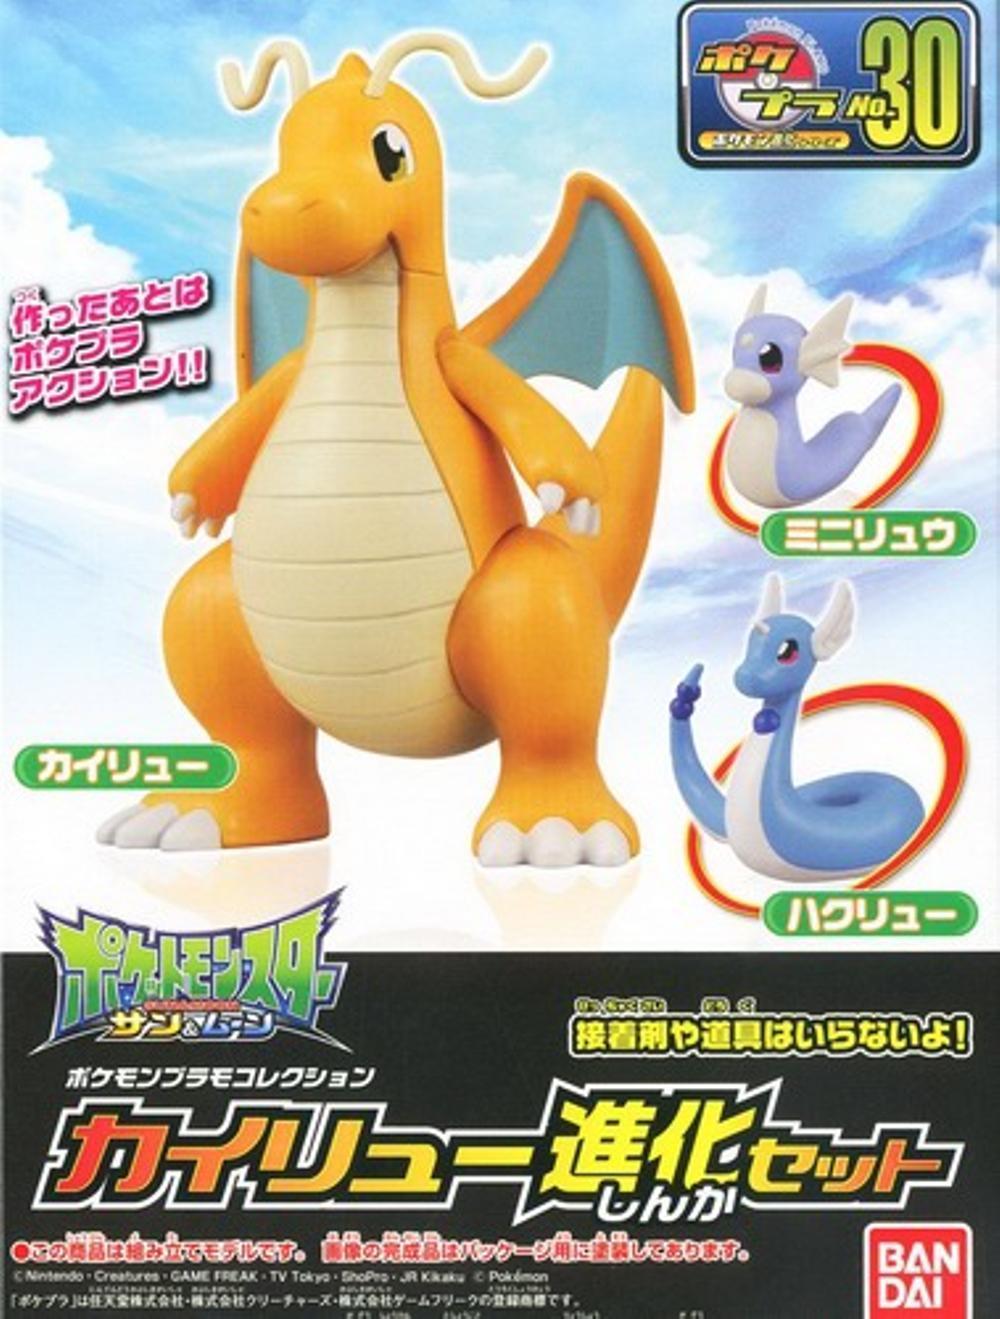 Bandai_Pokepla_Pokemon_Plamo_Kairyu_Dragonite_Evolution_set